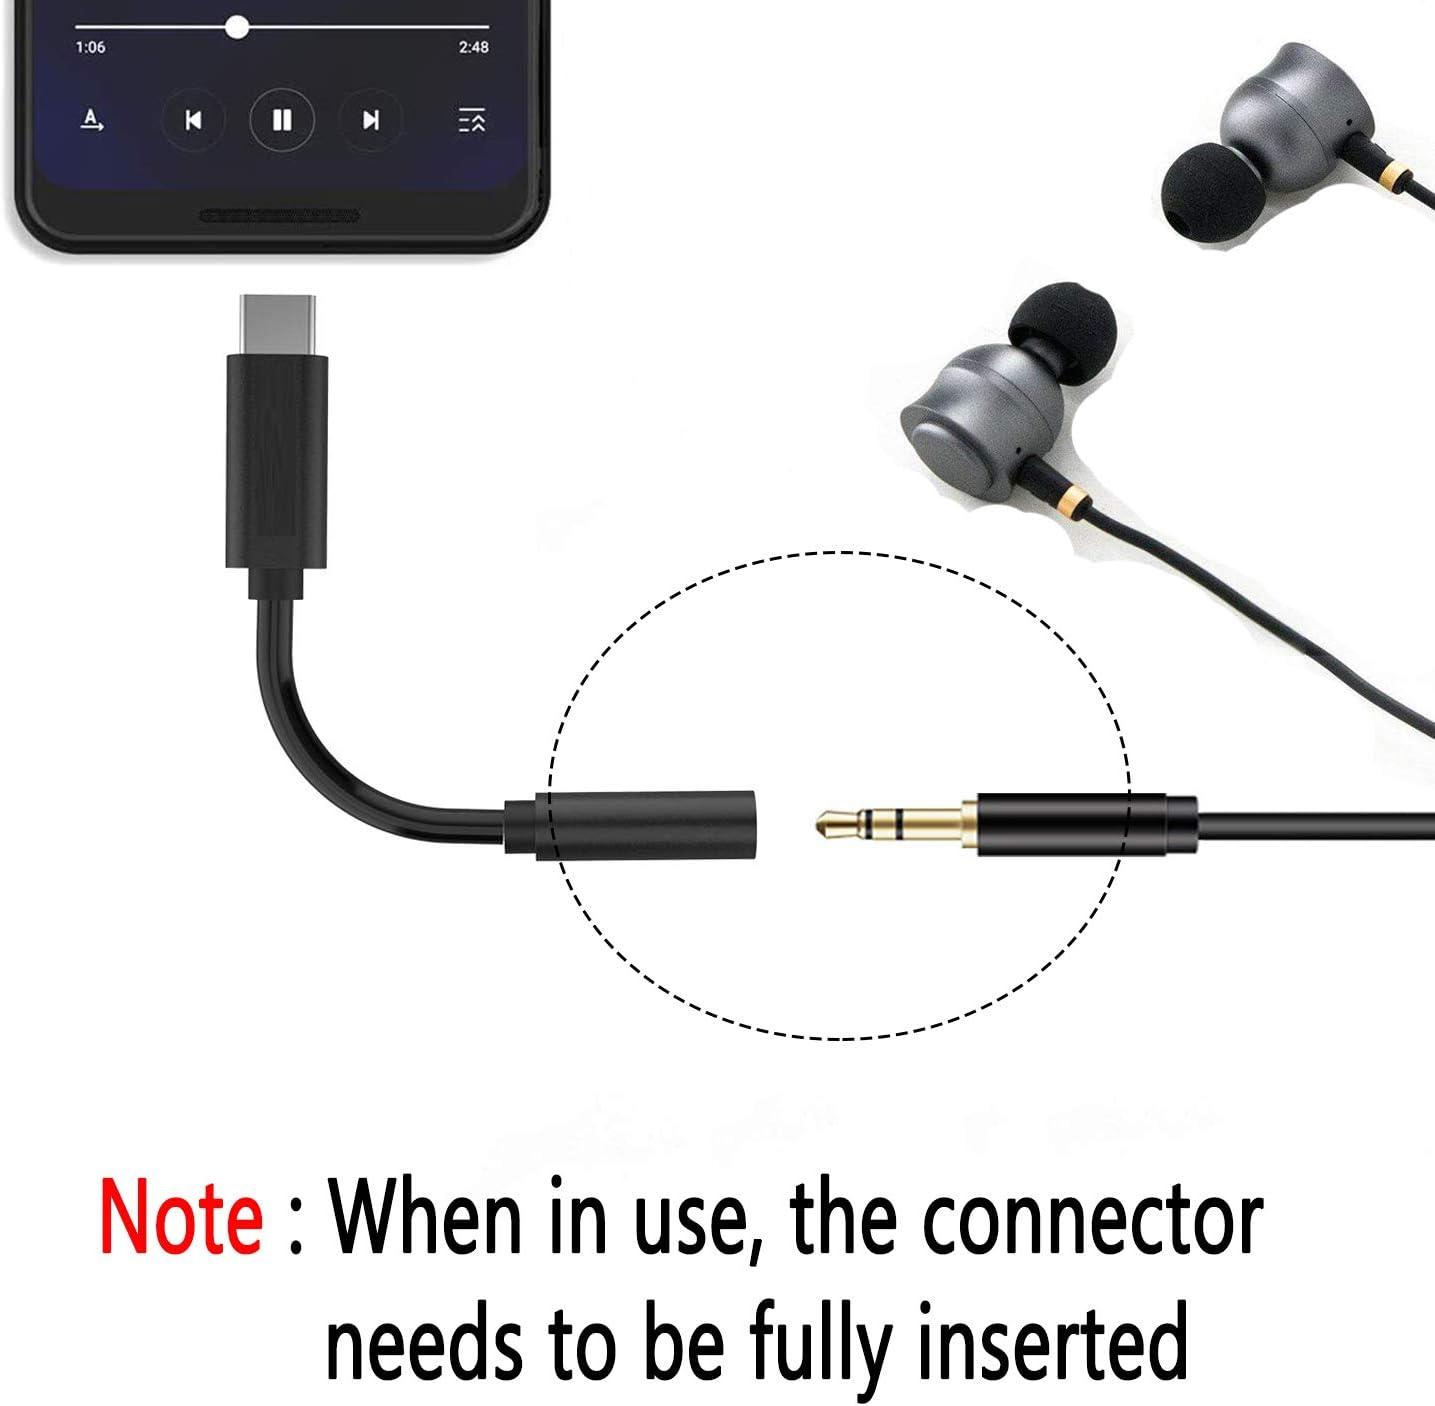 Samsung Note8//S8//S9 Plus USB-C to 3.5 mm Headphone Jack Adapter Type C to 3.5mm Aux Audio Converter HTC U12 LG iPad 2018//Motorola Moto Z//OnePlus 6T Black Support for Google Pixel 3//3 XL//2// 2XL